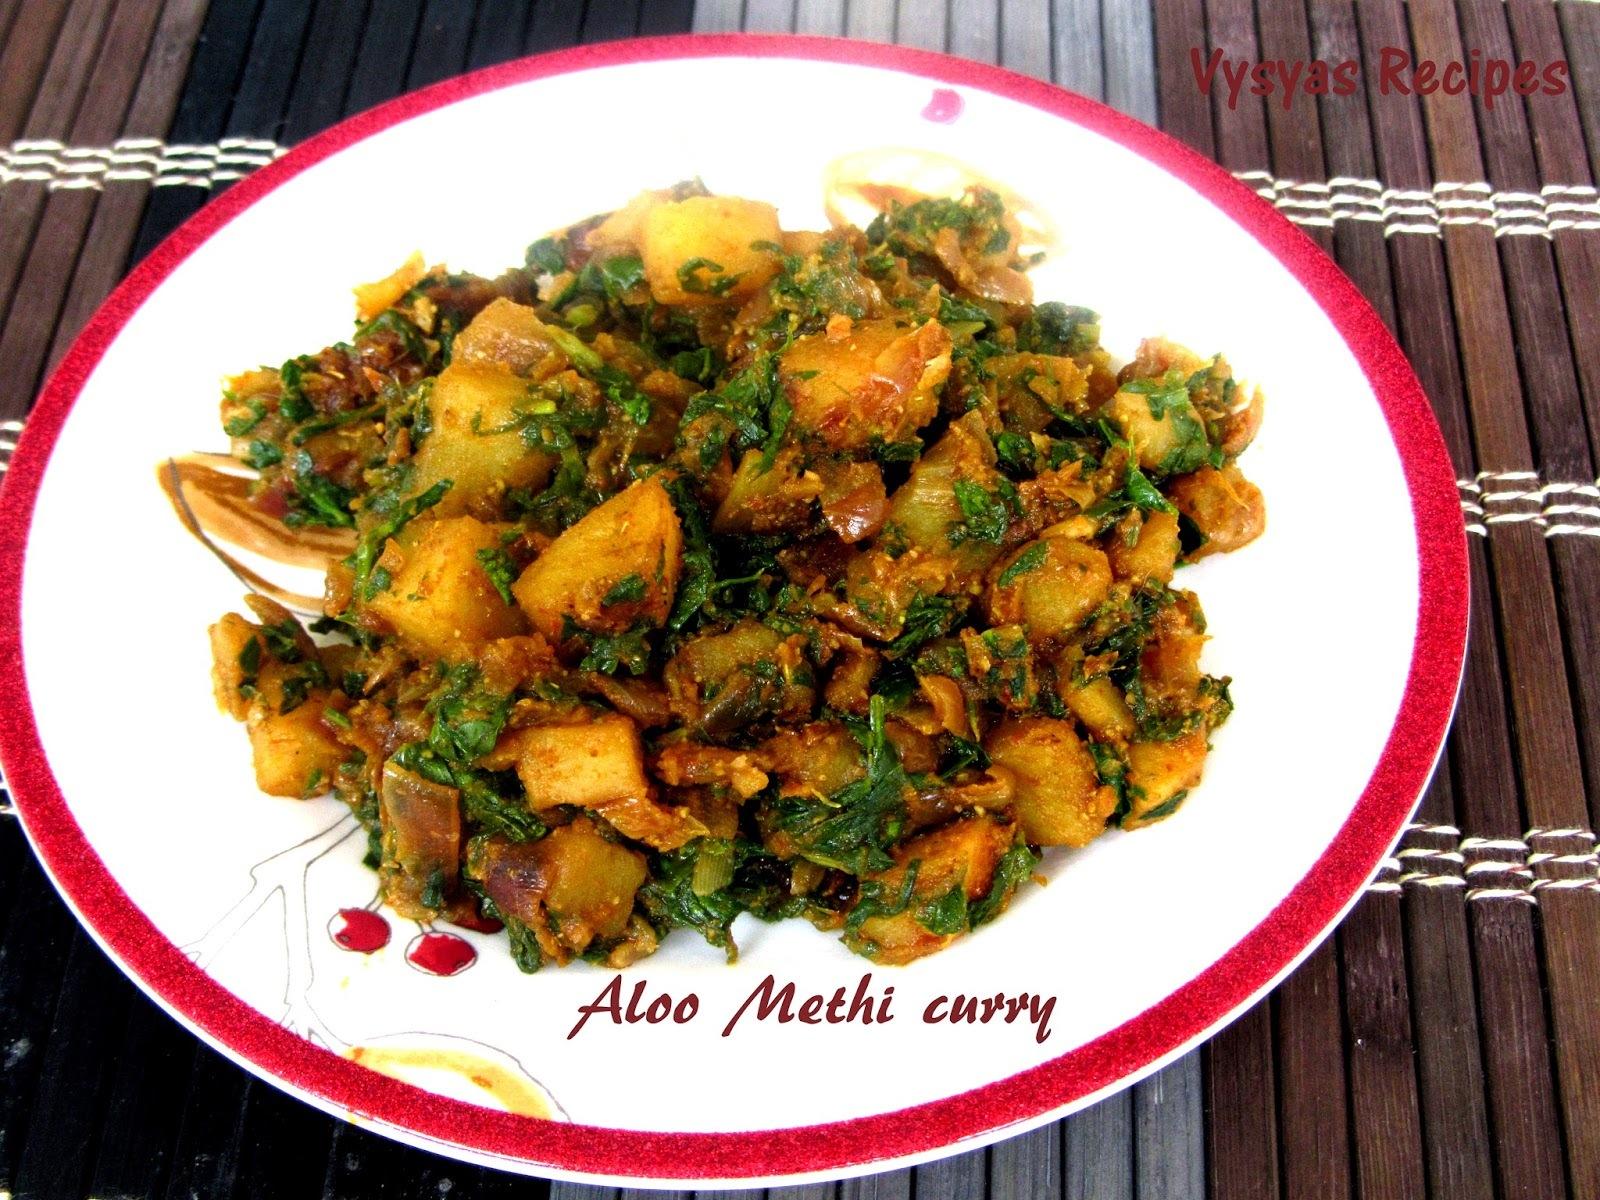 Aloo methi sabzi recipe - Aloo Methi Curry Recipe - Potato With Fenugreek leaves